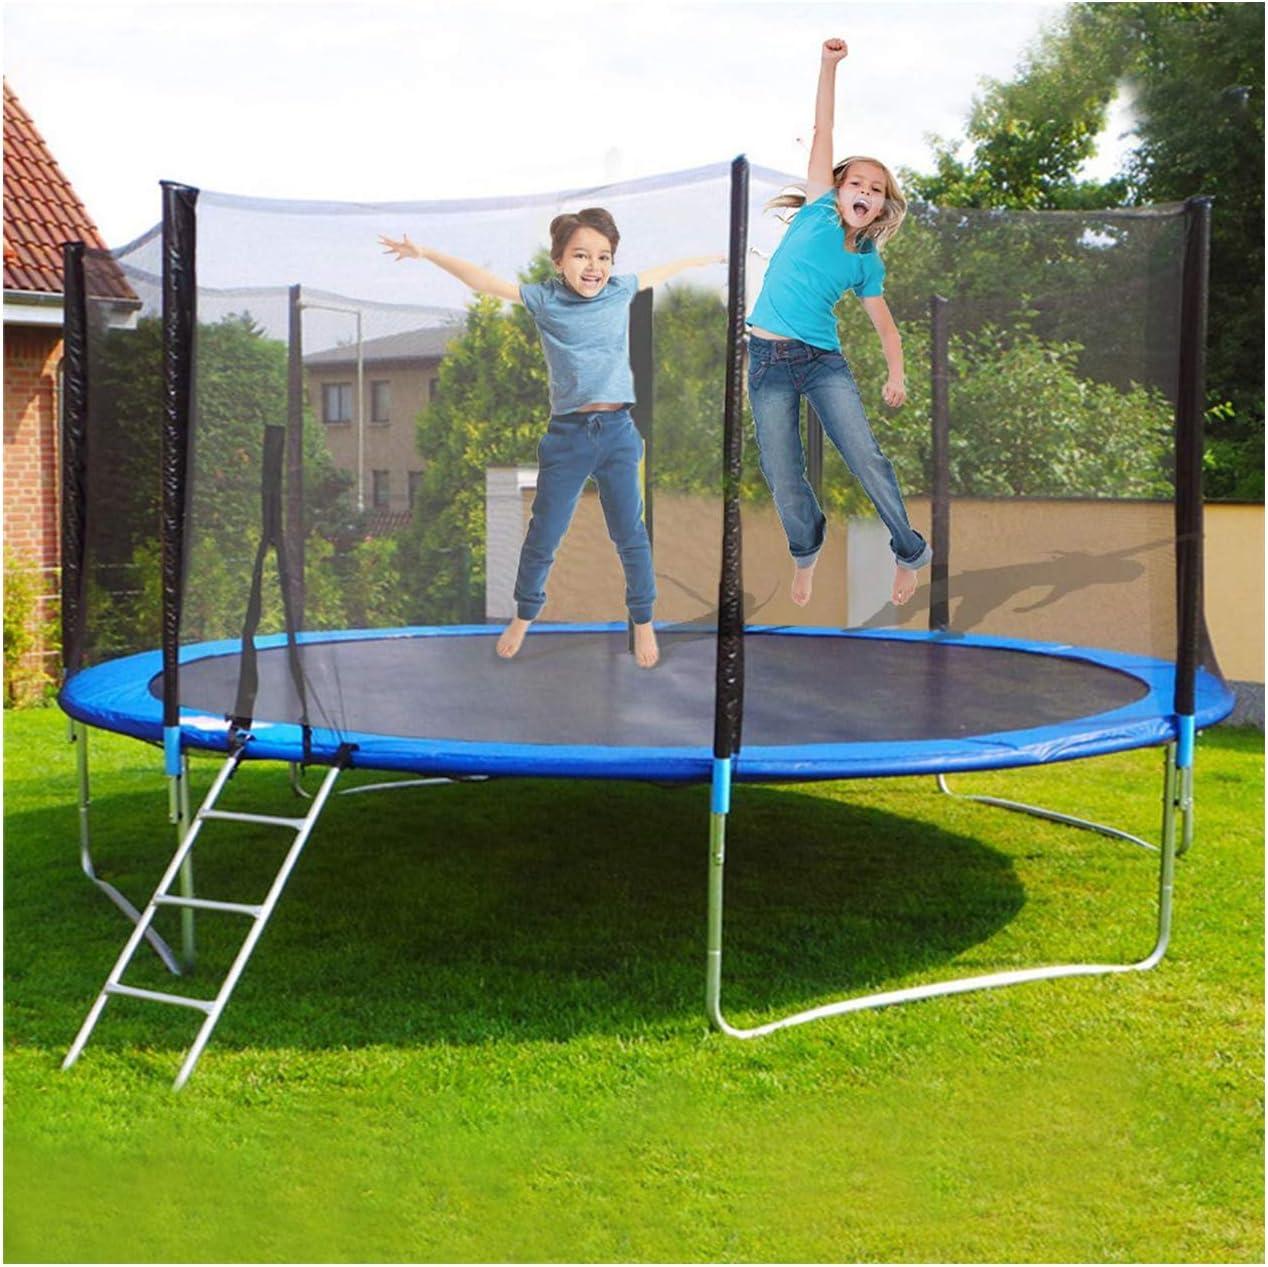 Amastore 12 FT メーカー公式 Trampol1ne Jumping Entertainment Wegit LB Mat 440 本物